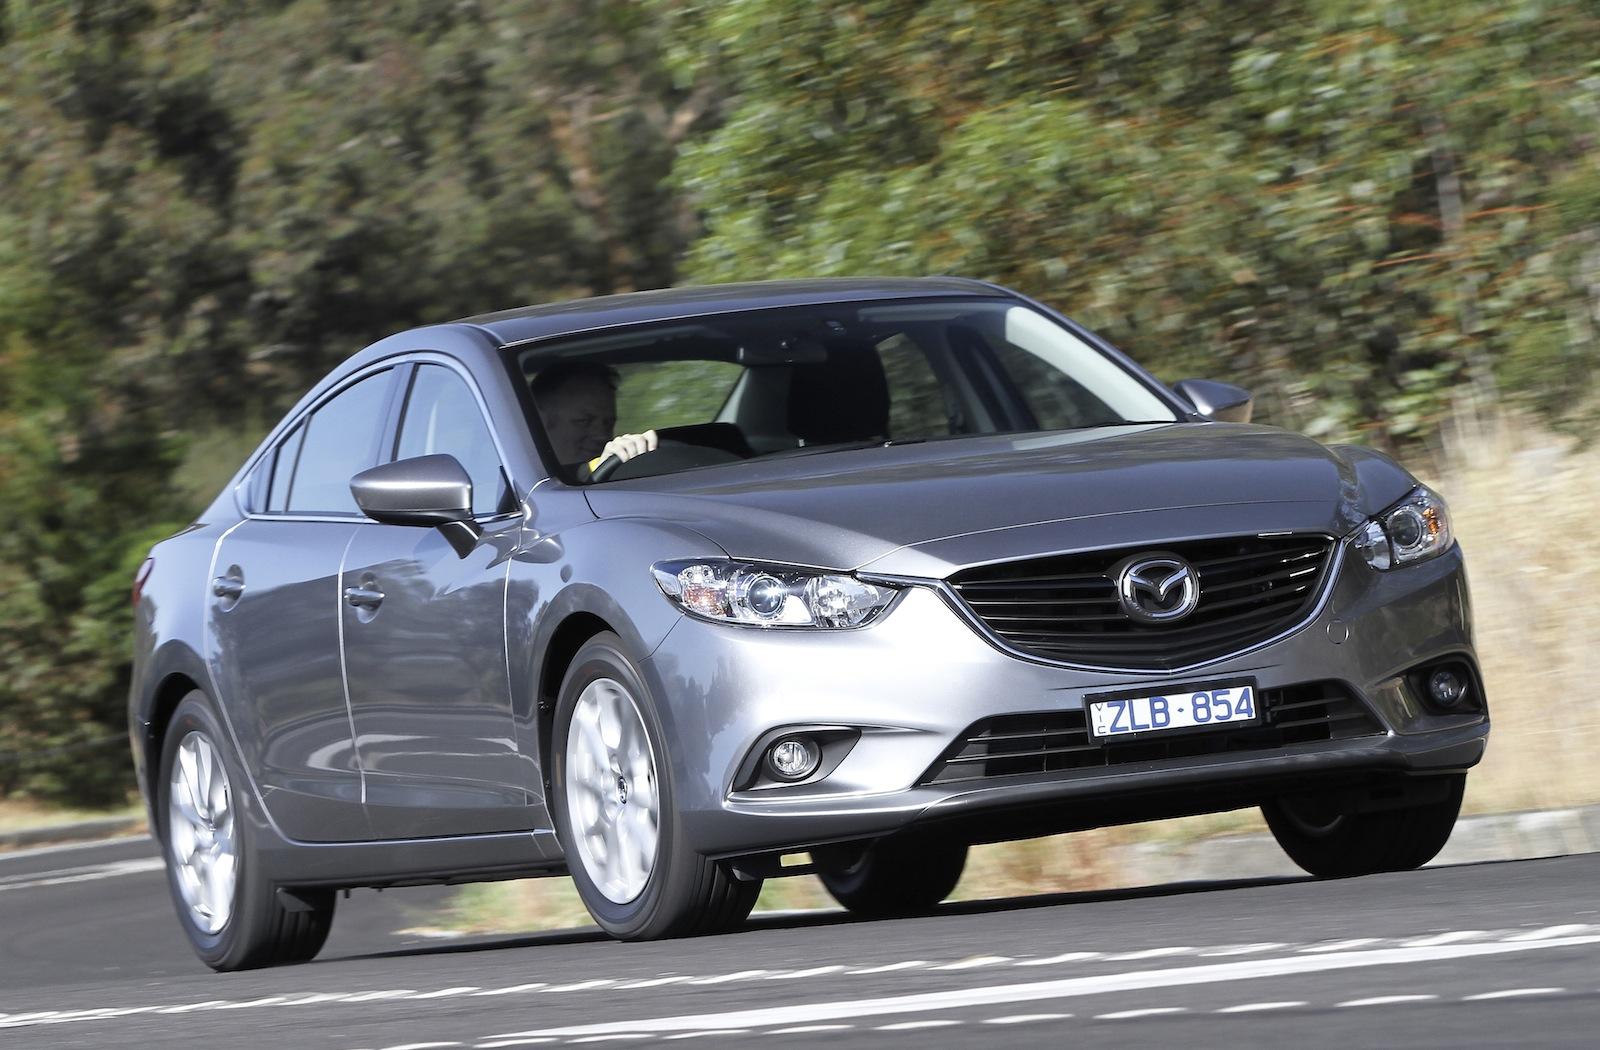 Kelebihan Kekurangan Mazda 6 2013 Murah Berkualitas